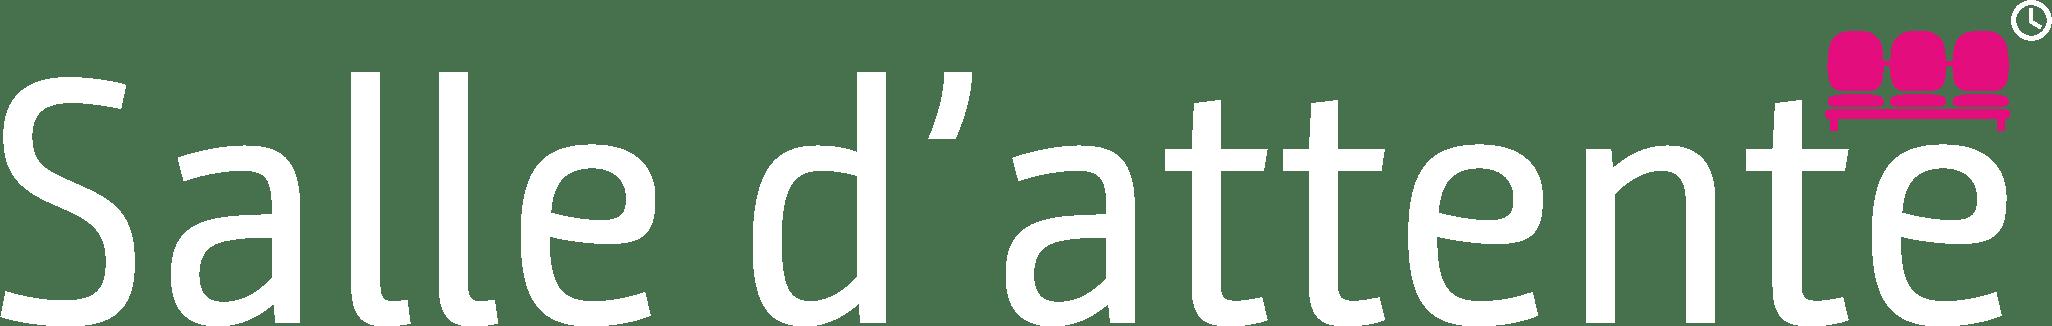 Logo Salle d'attente